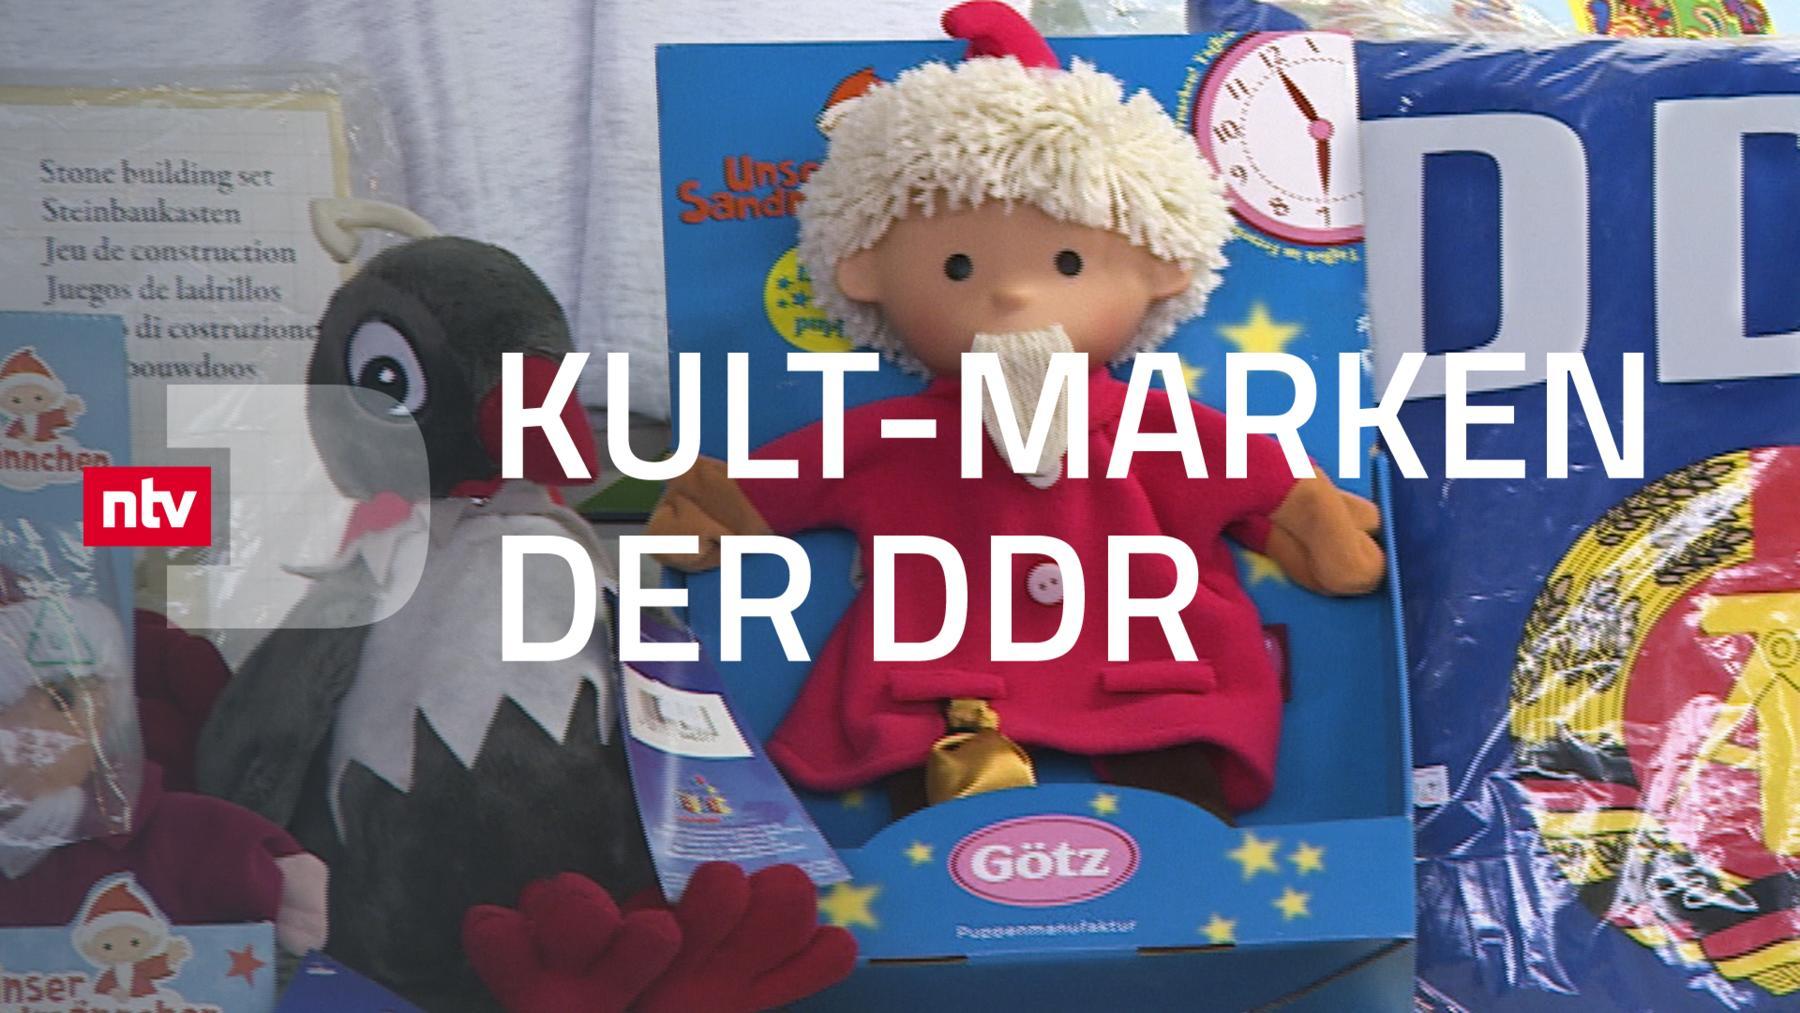 Kult-Marken der DDR